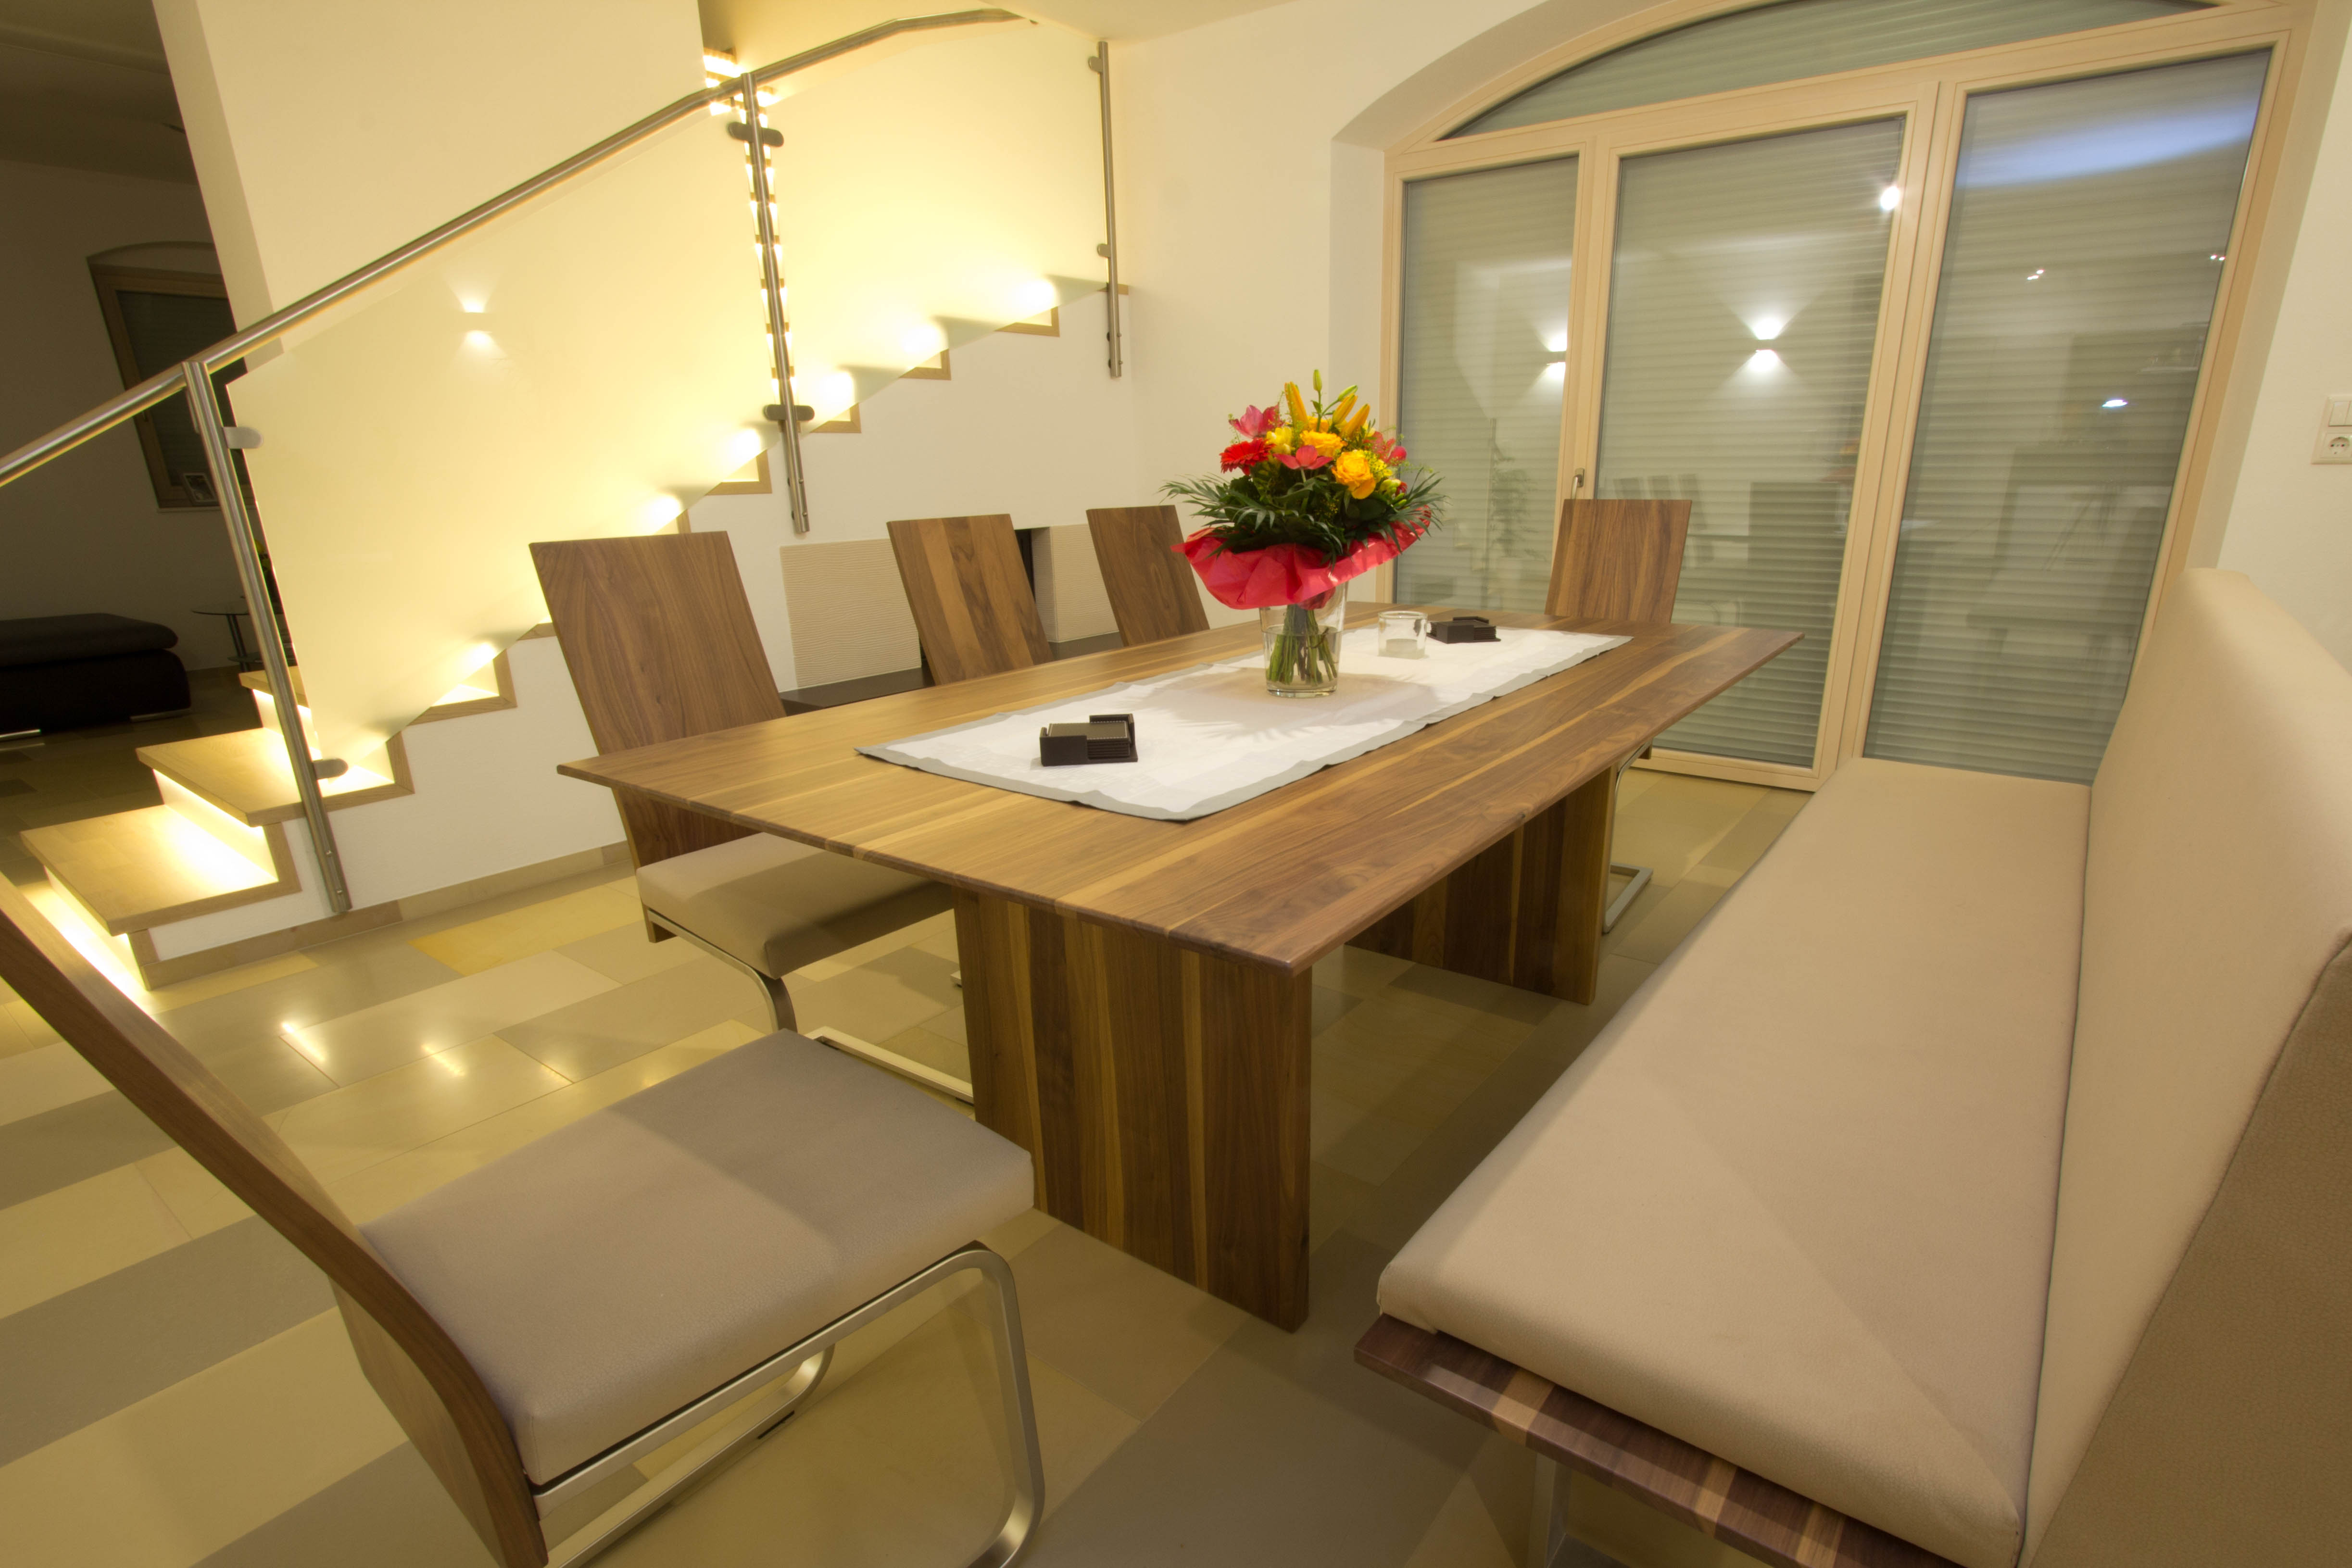 Modern Diner Sitzgruppen : Sitzgruppe massivholz nuss tischler grieskirchen